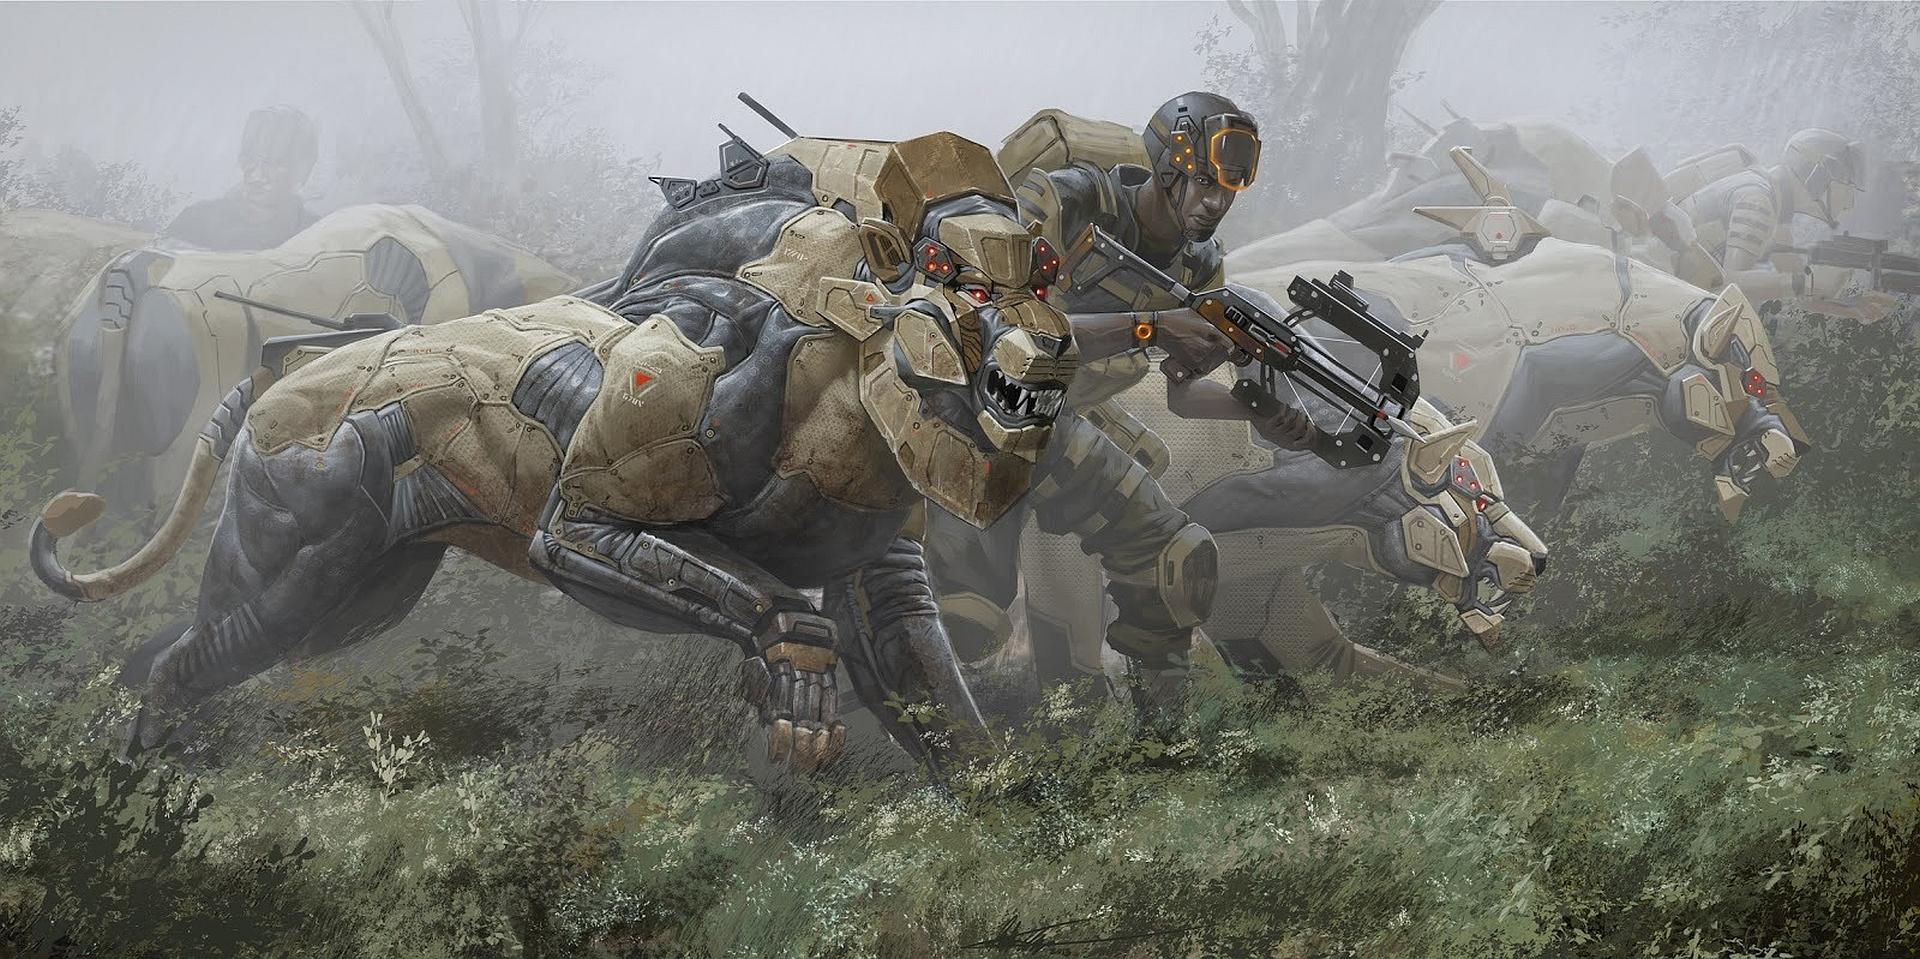 1081-on-the-hunt-robert-chew